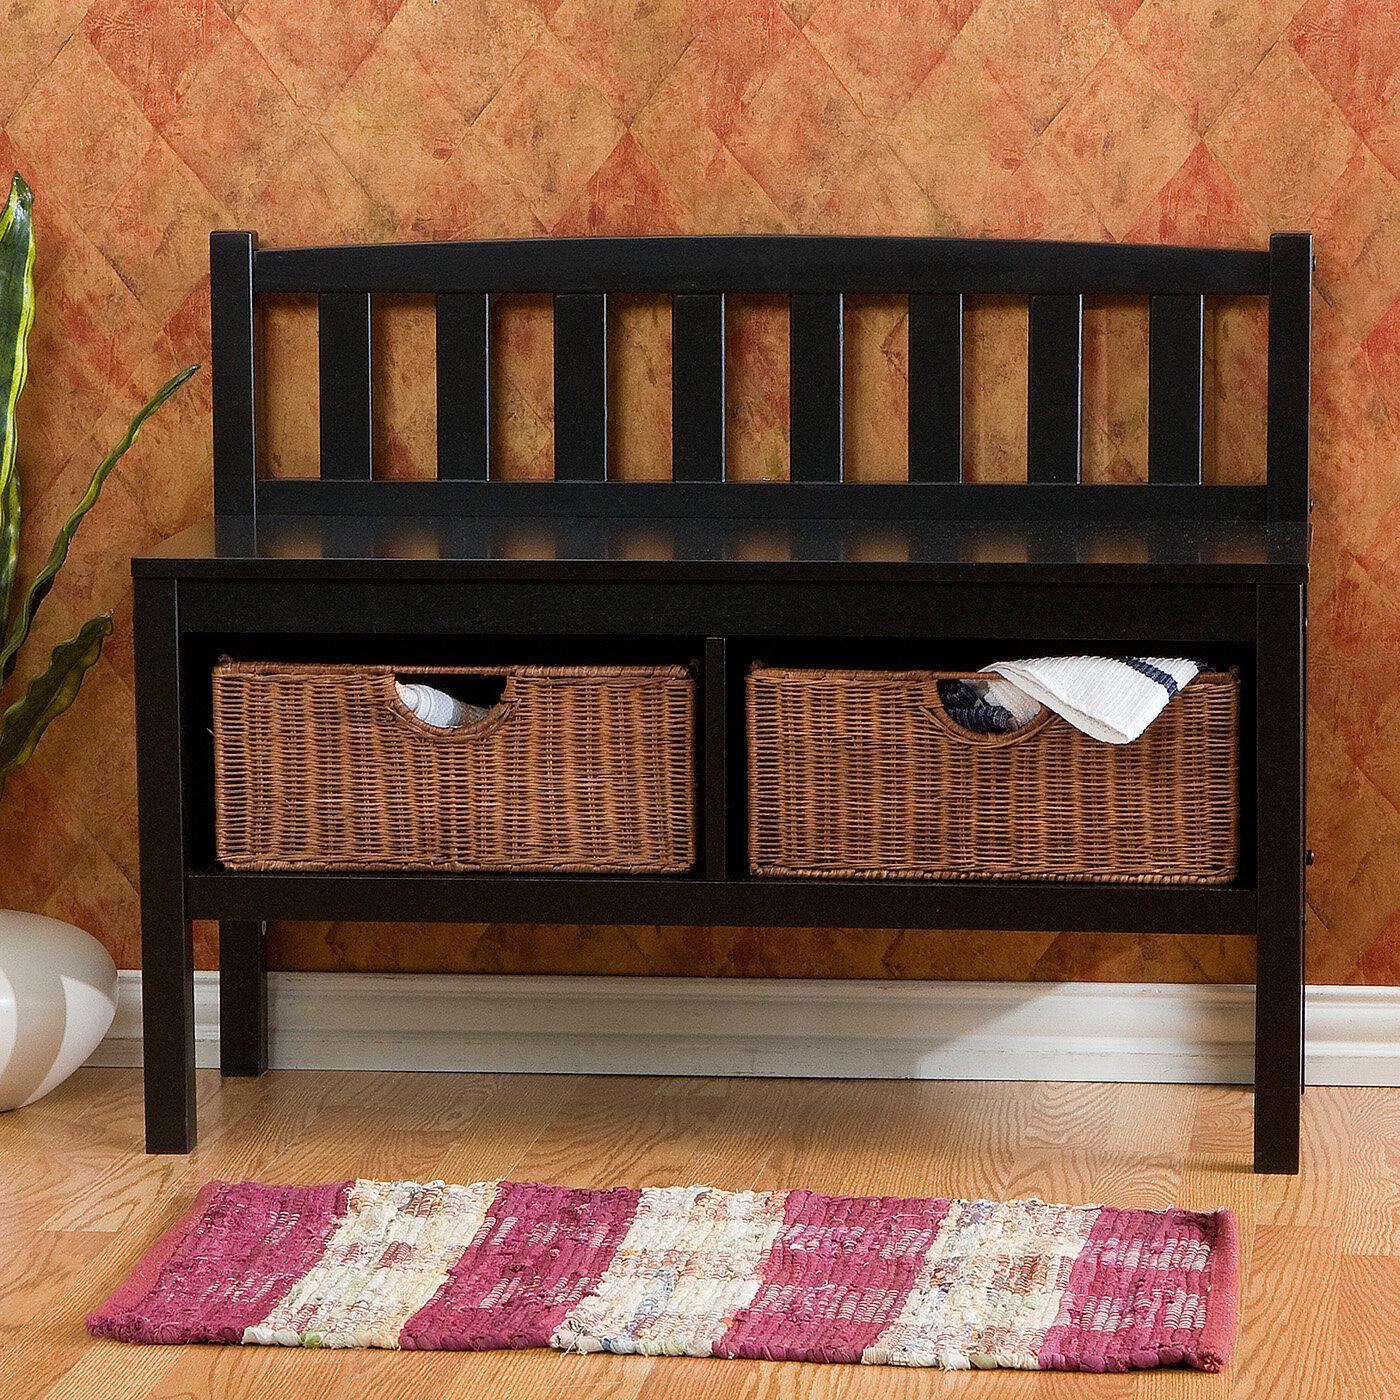 Beau Beachcrest Home Offerman Wood Storage Bench With Rattan Baskets U0026 Reviews    Wayfair